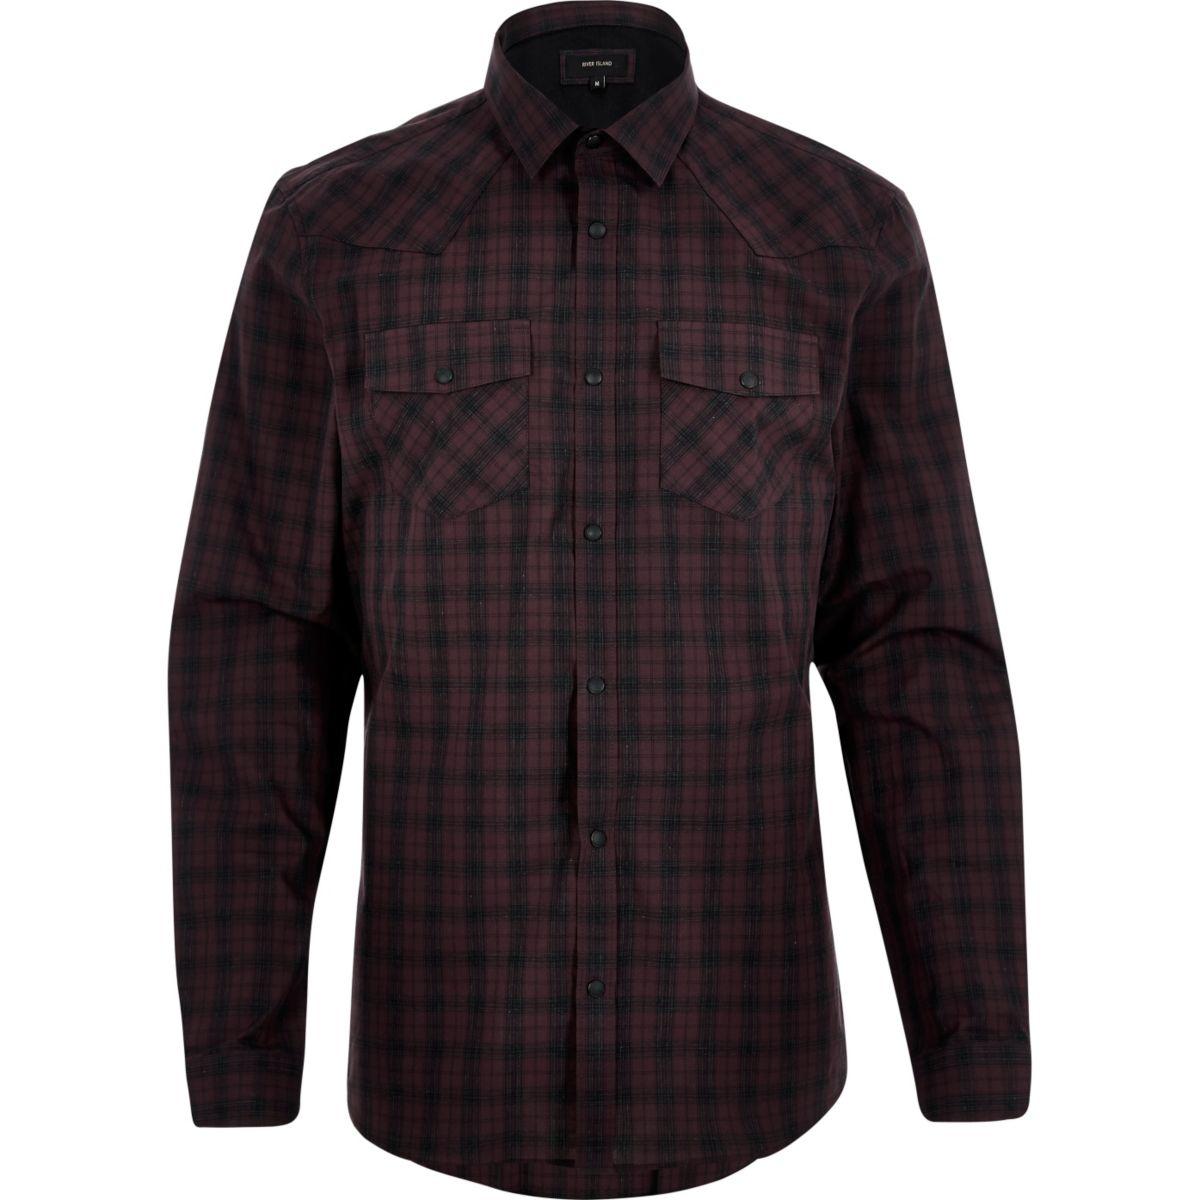 Burgundy check western shirt